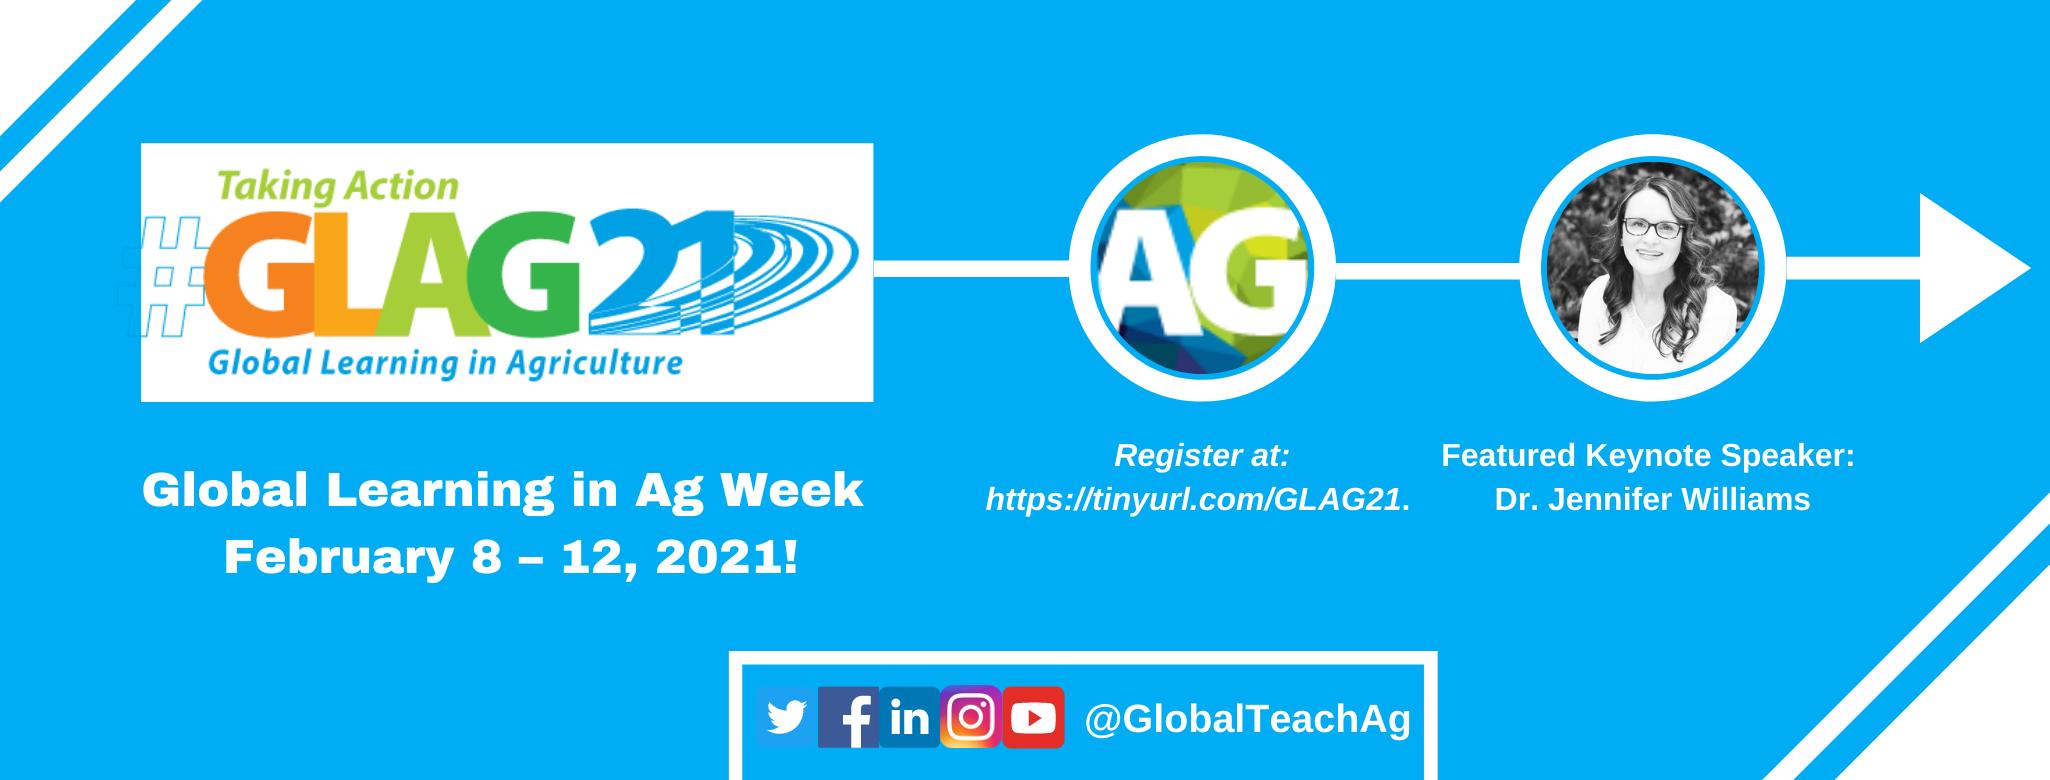 GLAG21 Take Action!